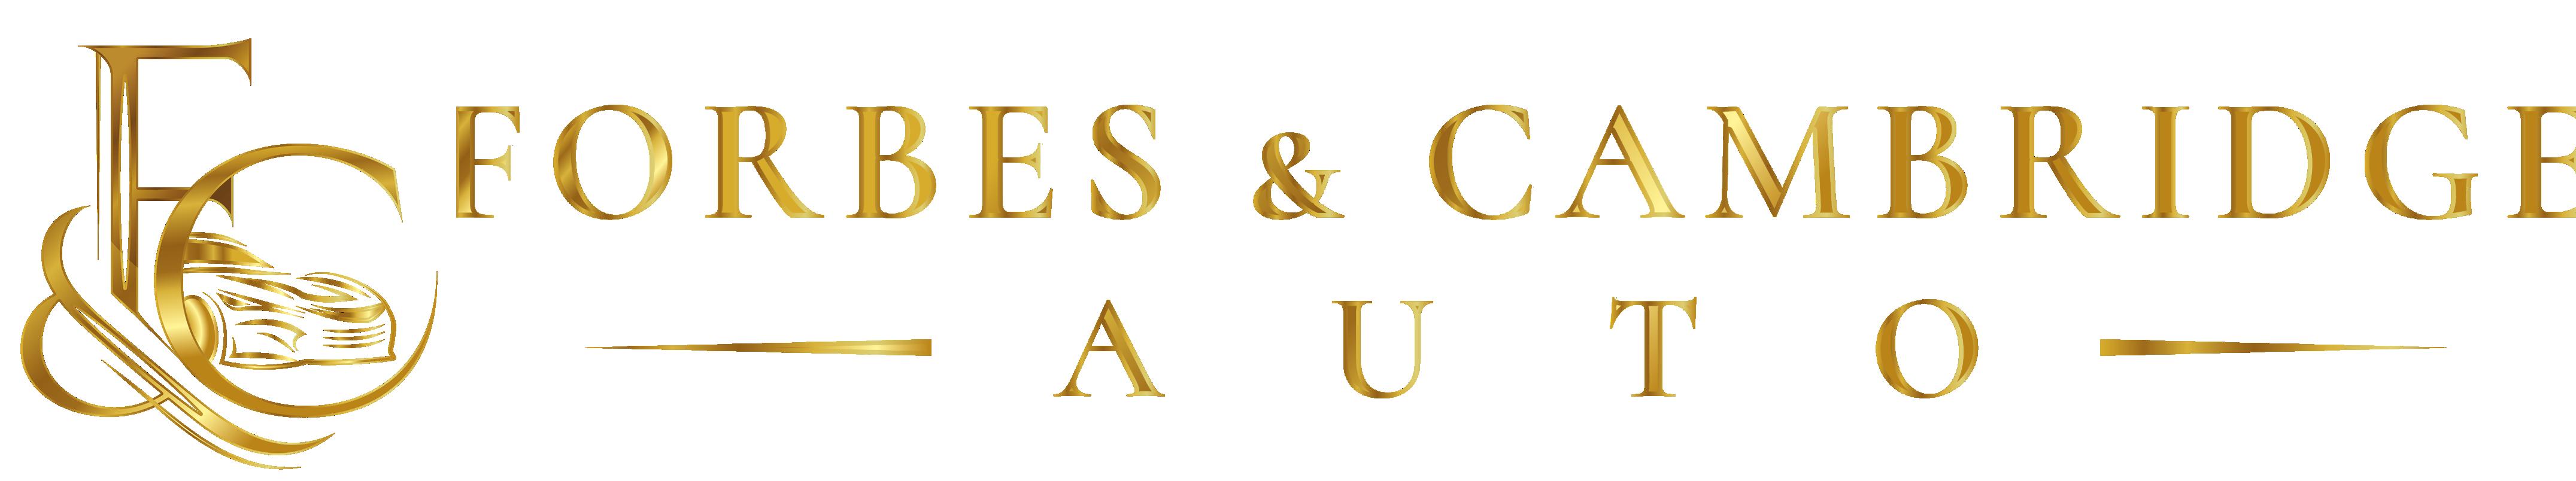 Forbes & Cambridge Auto LLC